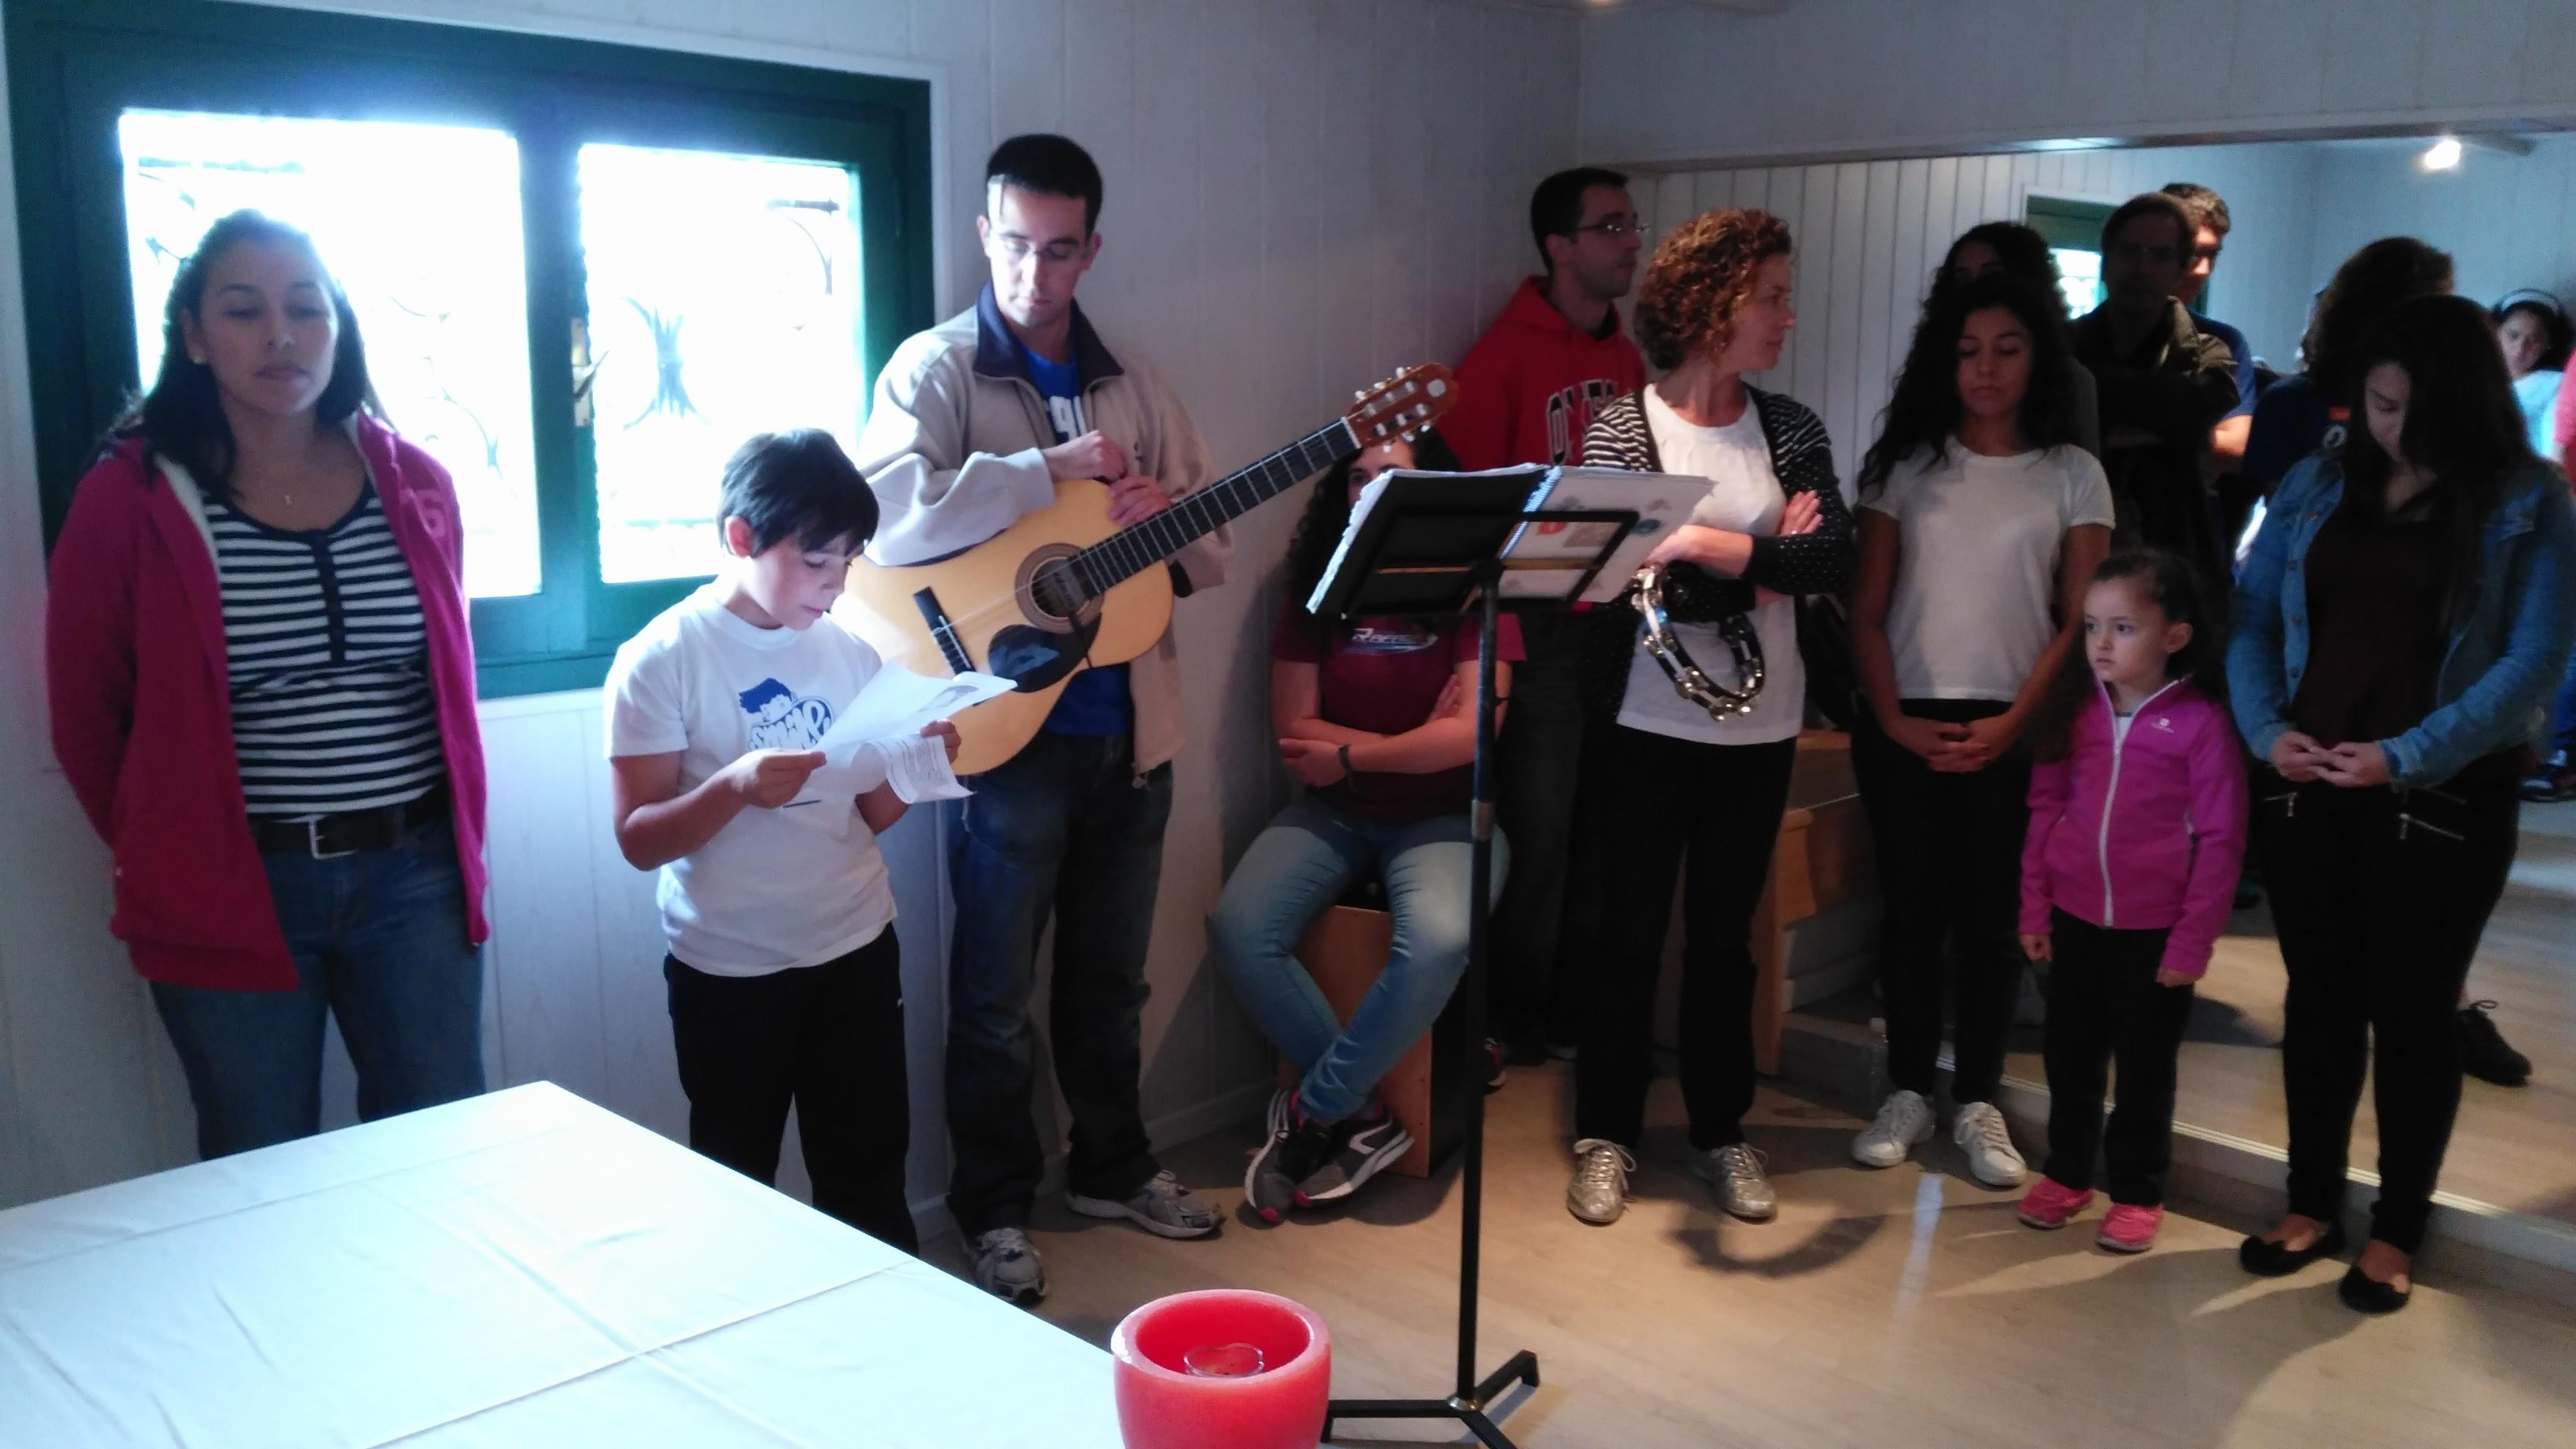 Picasa - 2015.09.12-13 - Convivencia Sector Familias(2).jpg